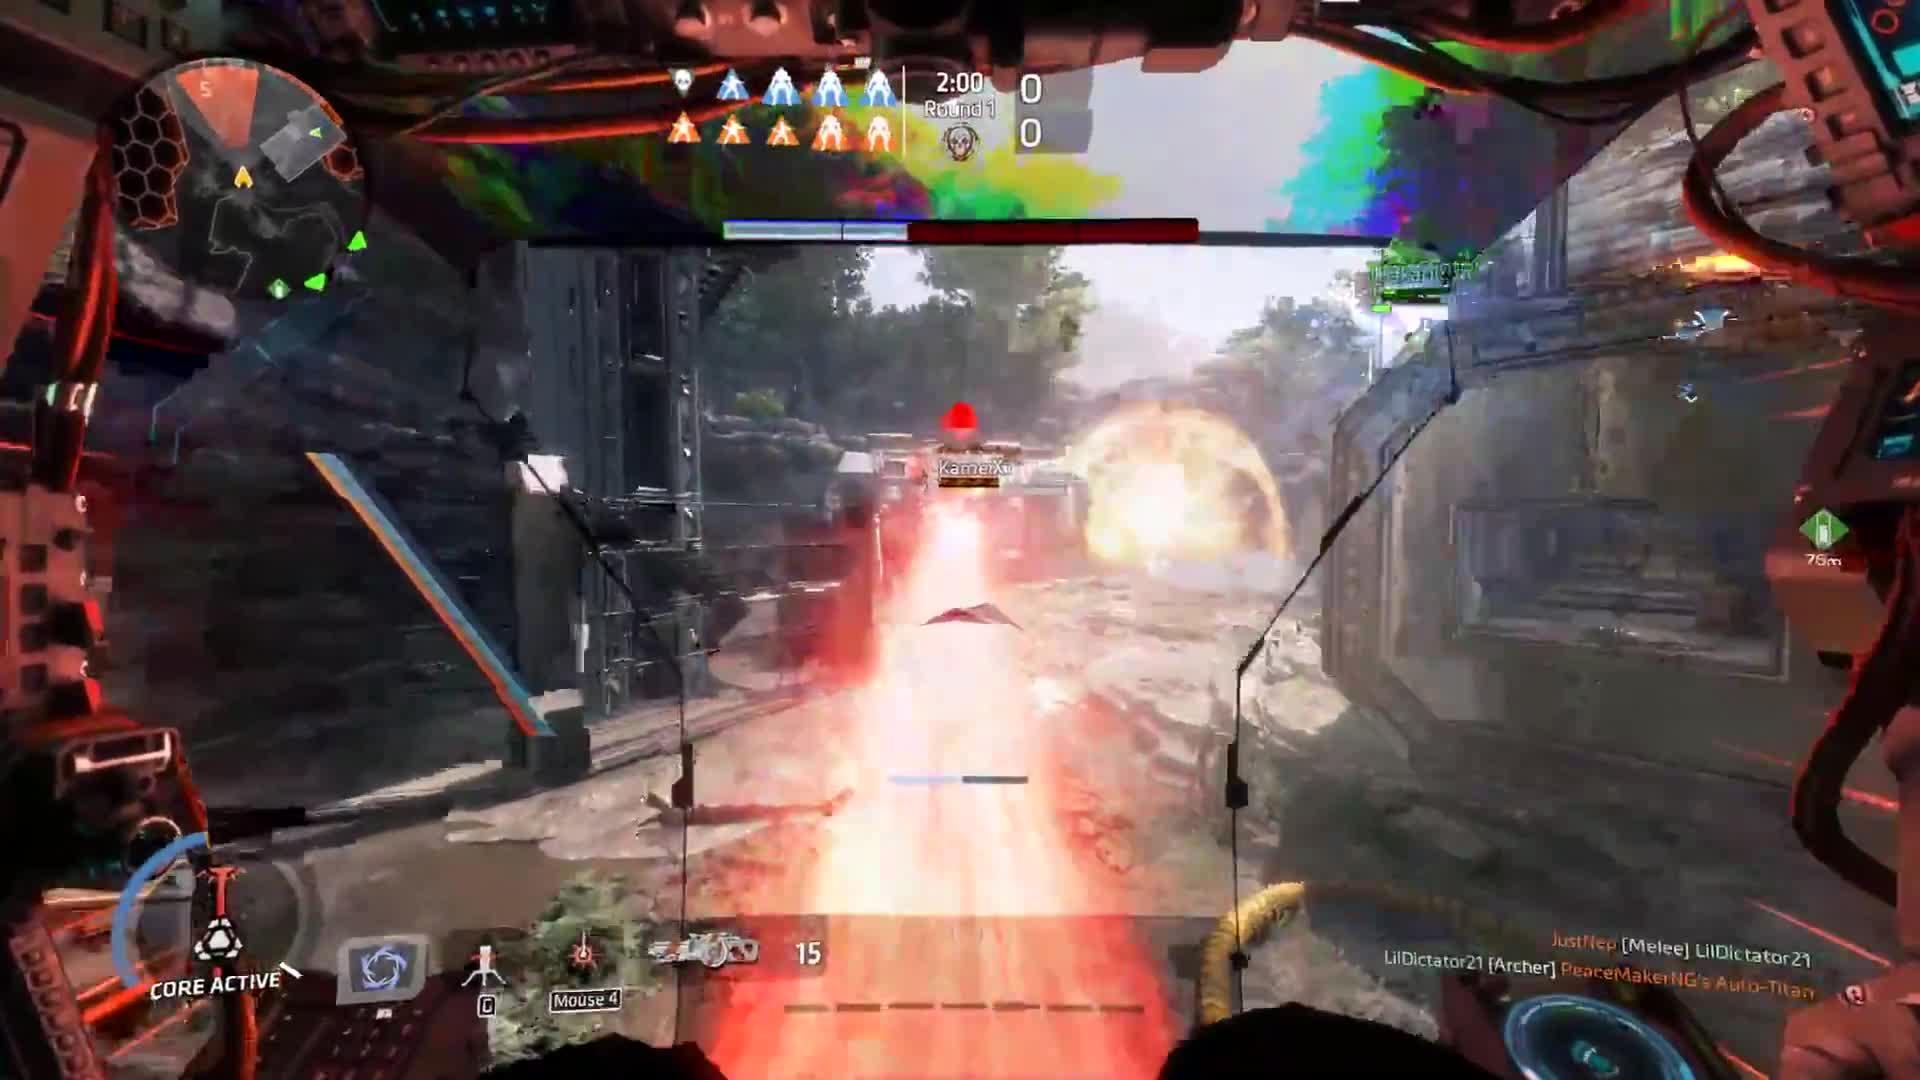 Gaming, Joonon, Titanfall 2 GIFs